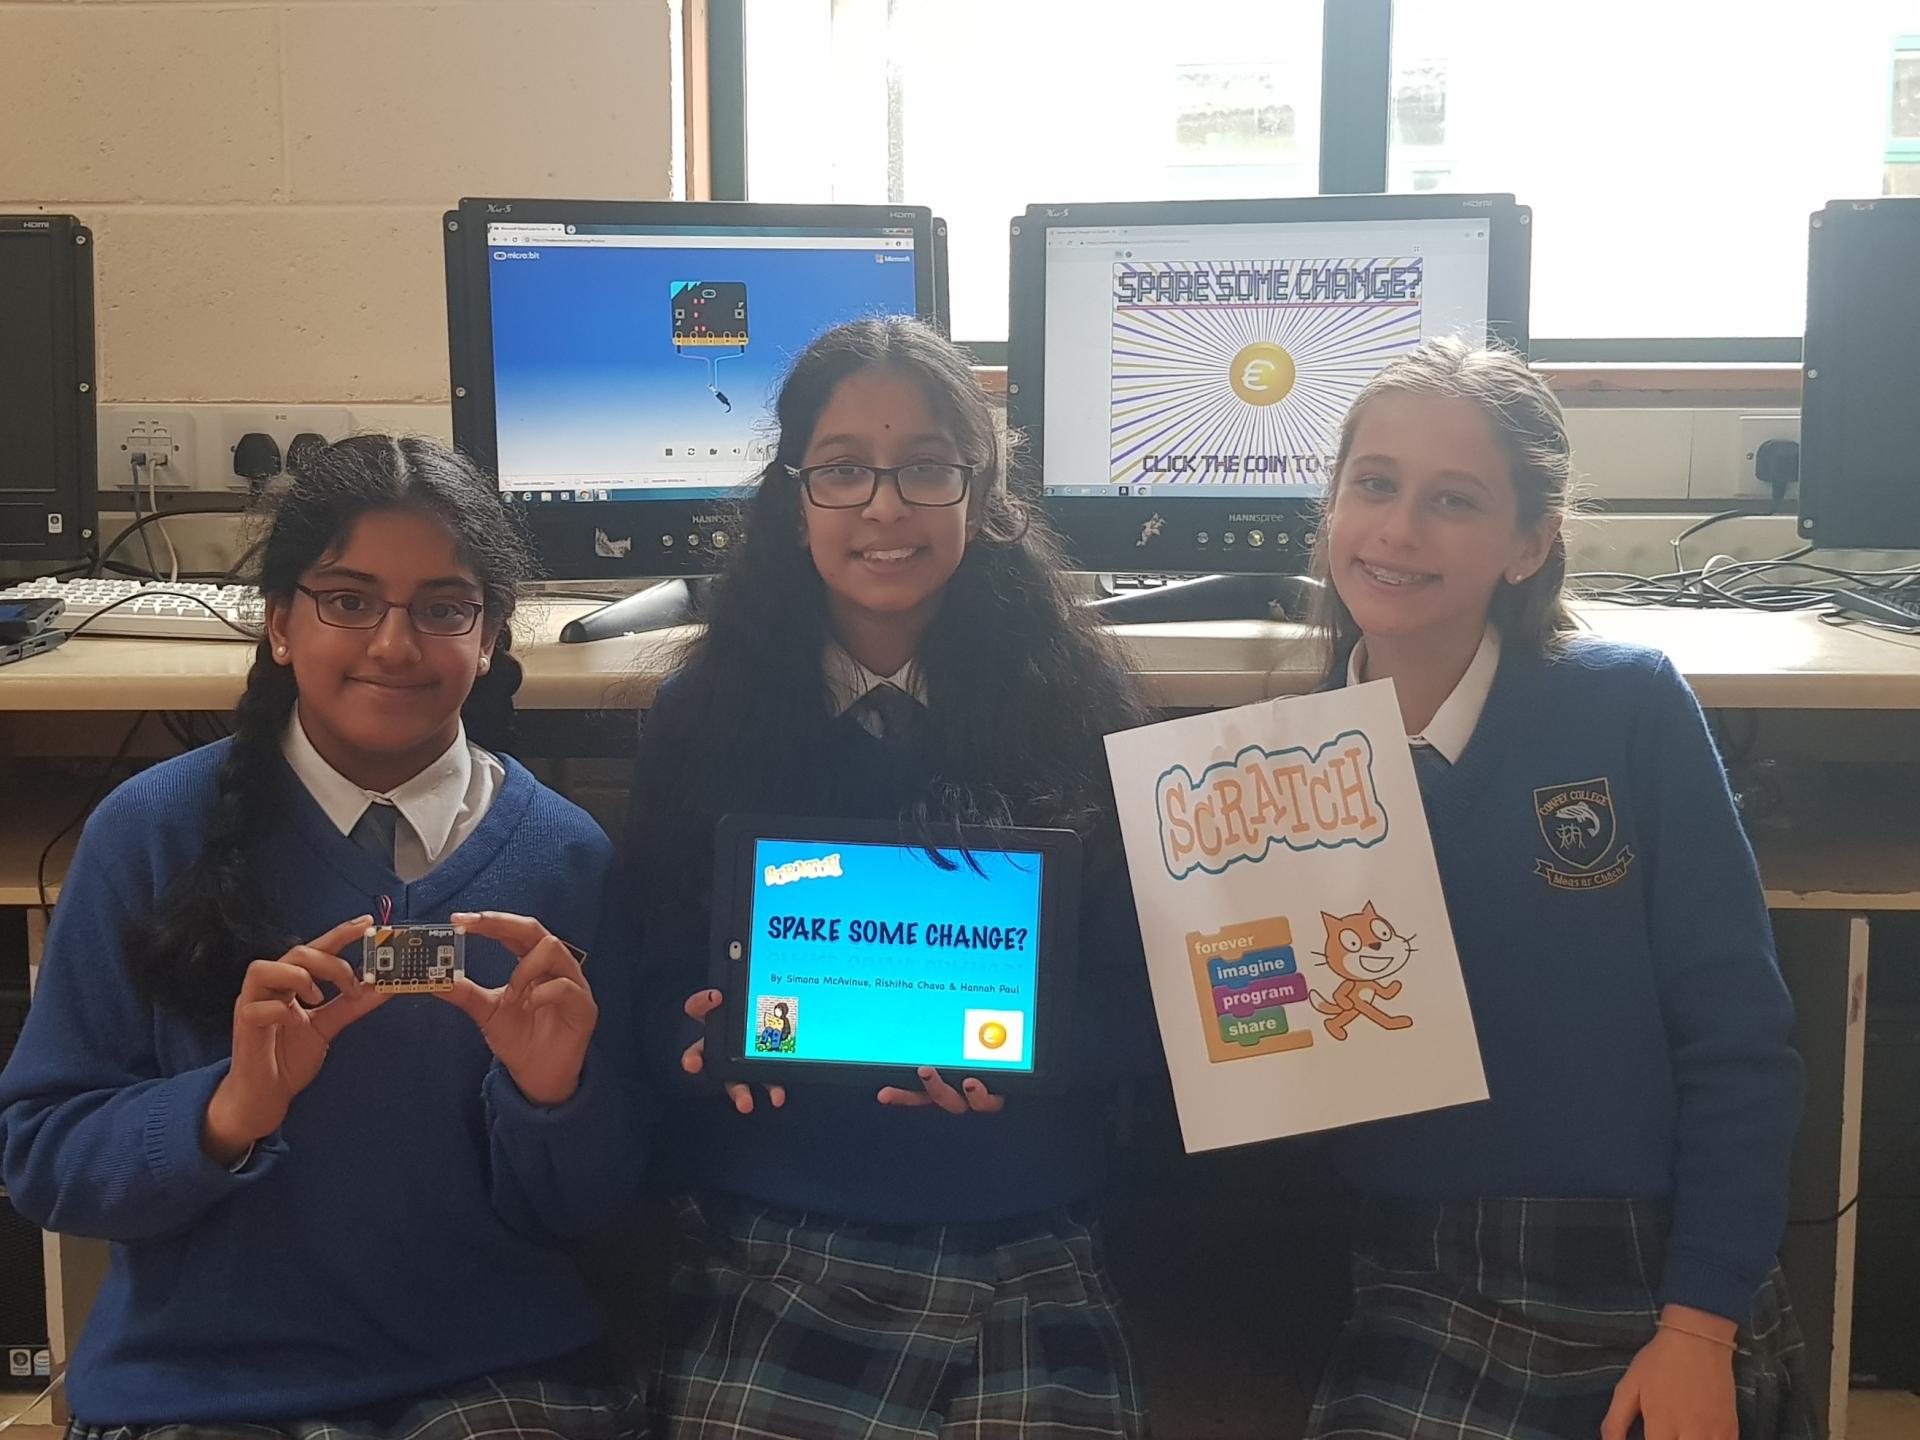 Hannah Paul, Rishitha Chava, Simona McAvinue. All 1st year students from Confey College Leixlip